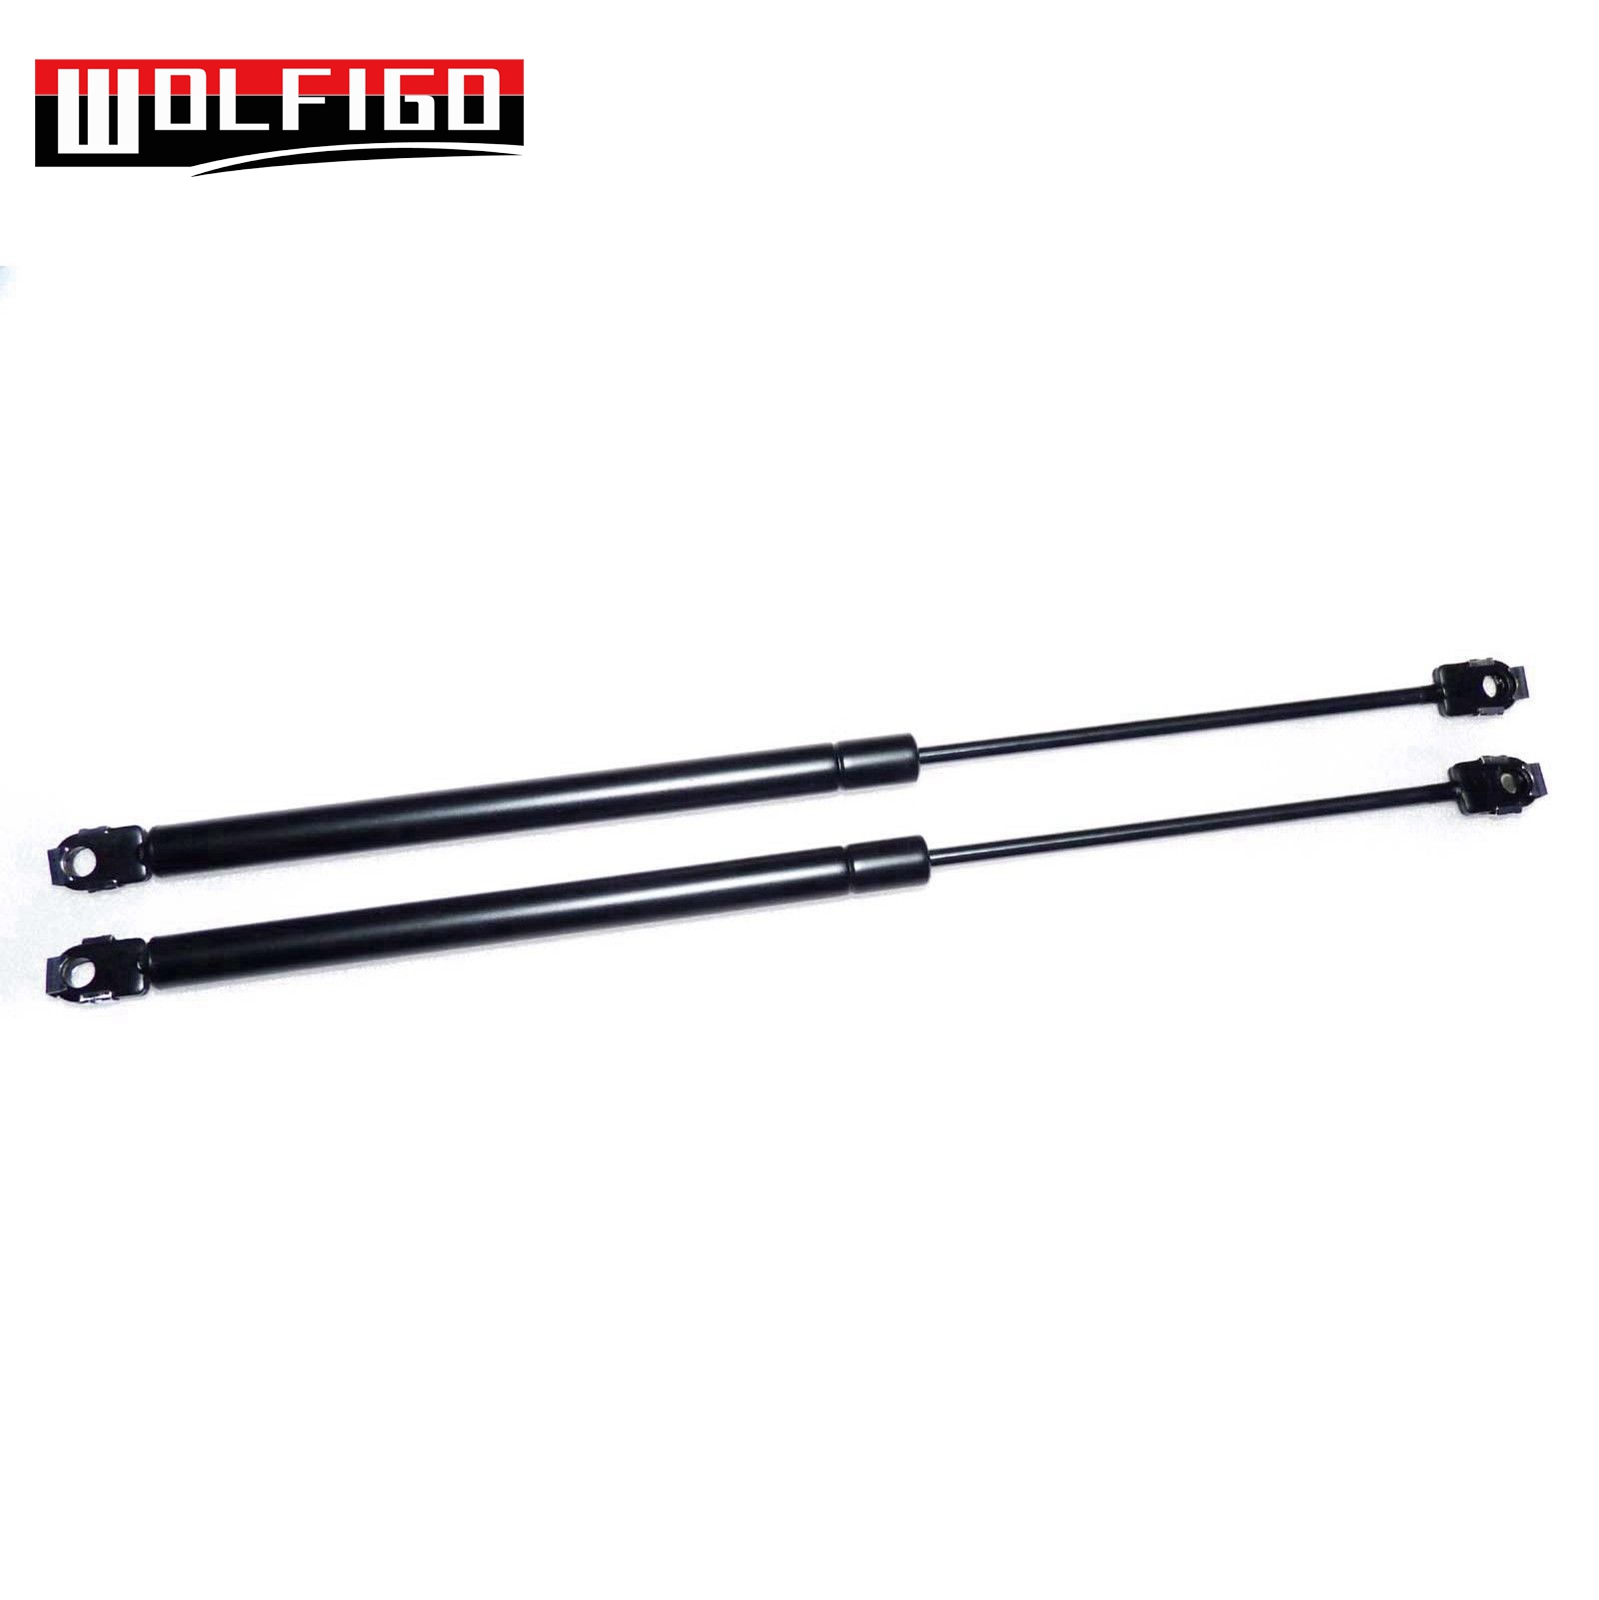 WOLFIGO Hood Shock Gas Pressurized Support Damper Strut Lid 51238119558 For E36 Coupe Convertible 318i 318 IS 323i 325i 328i M3